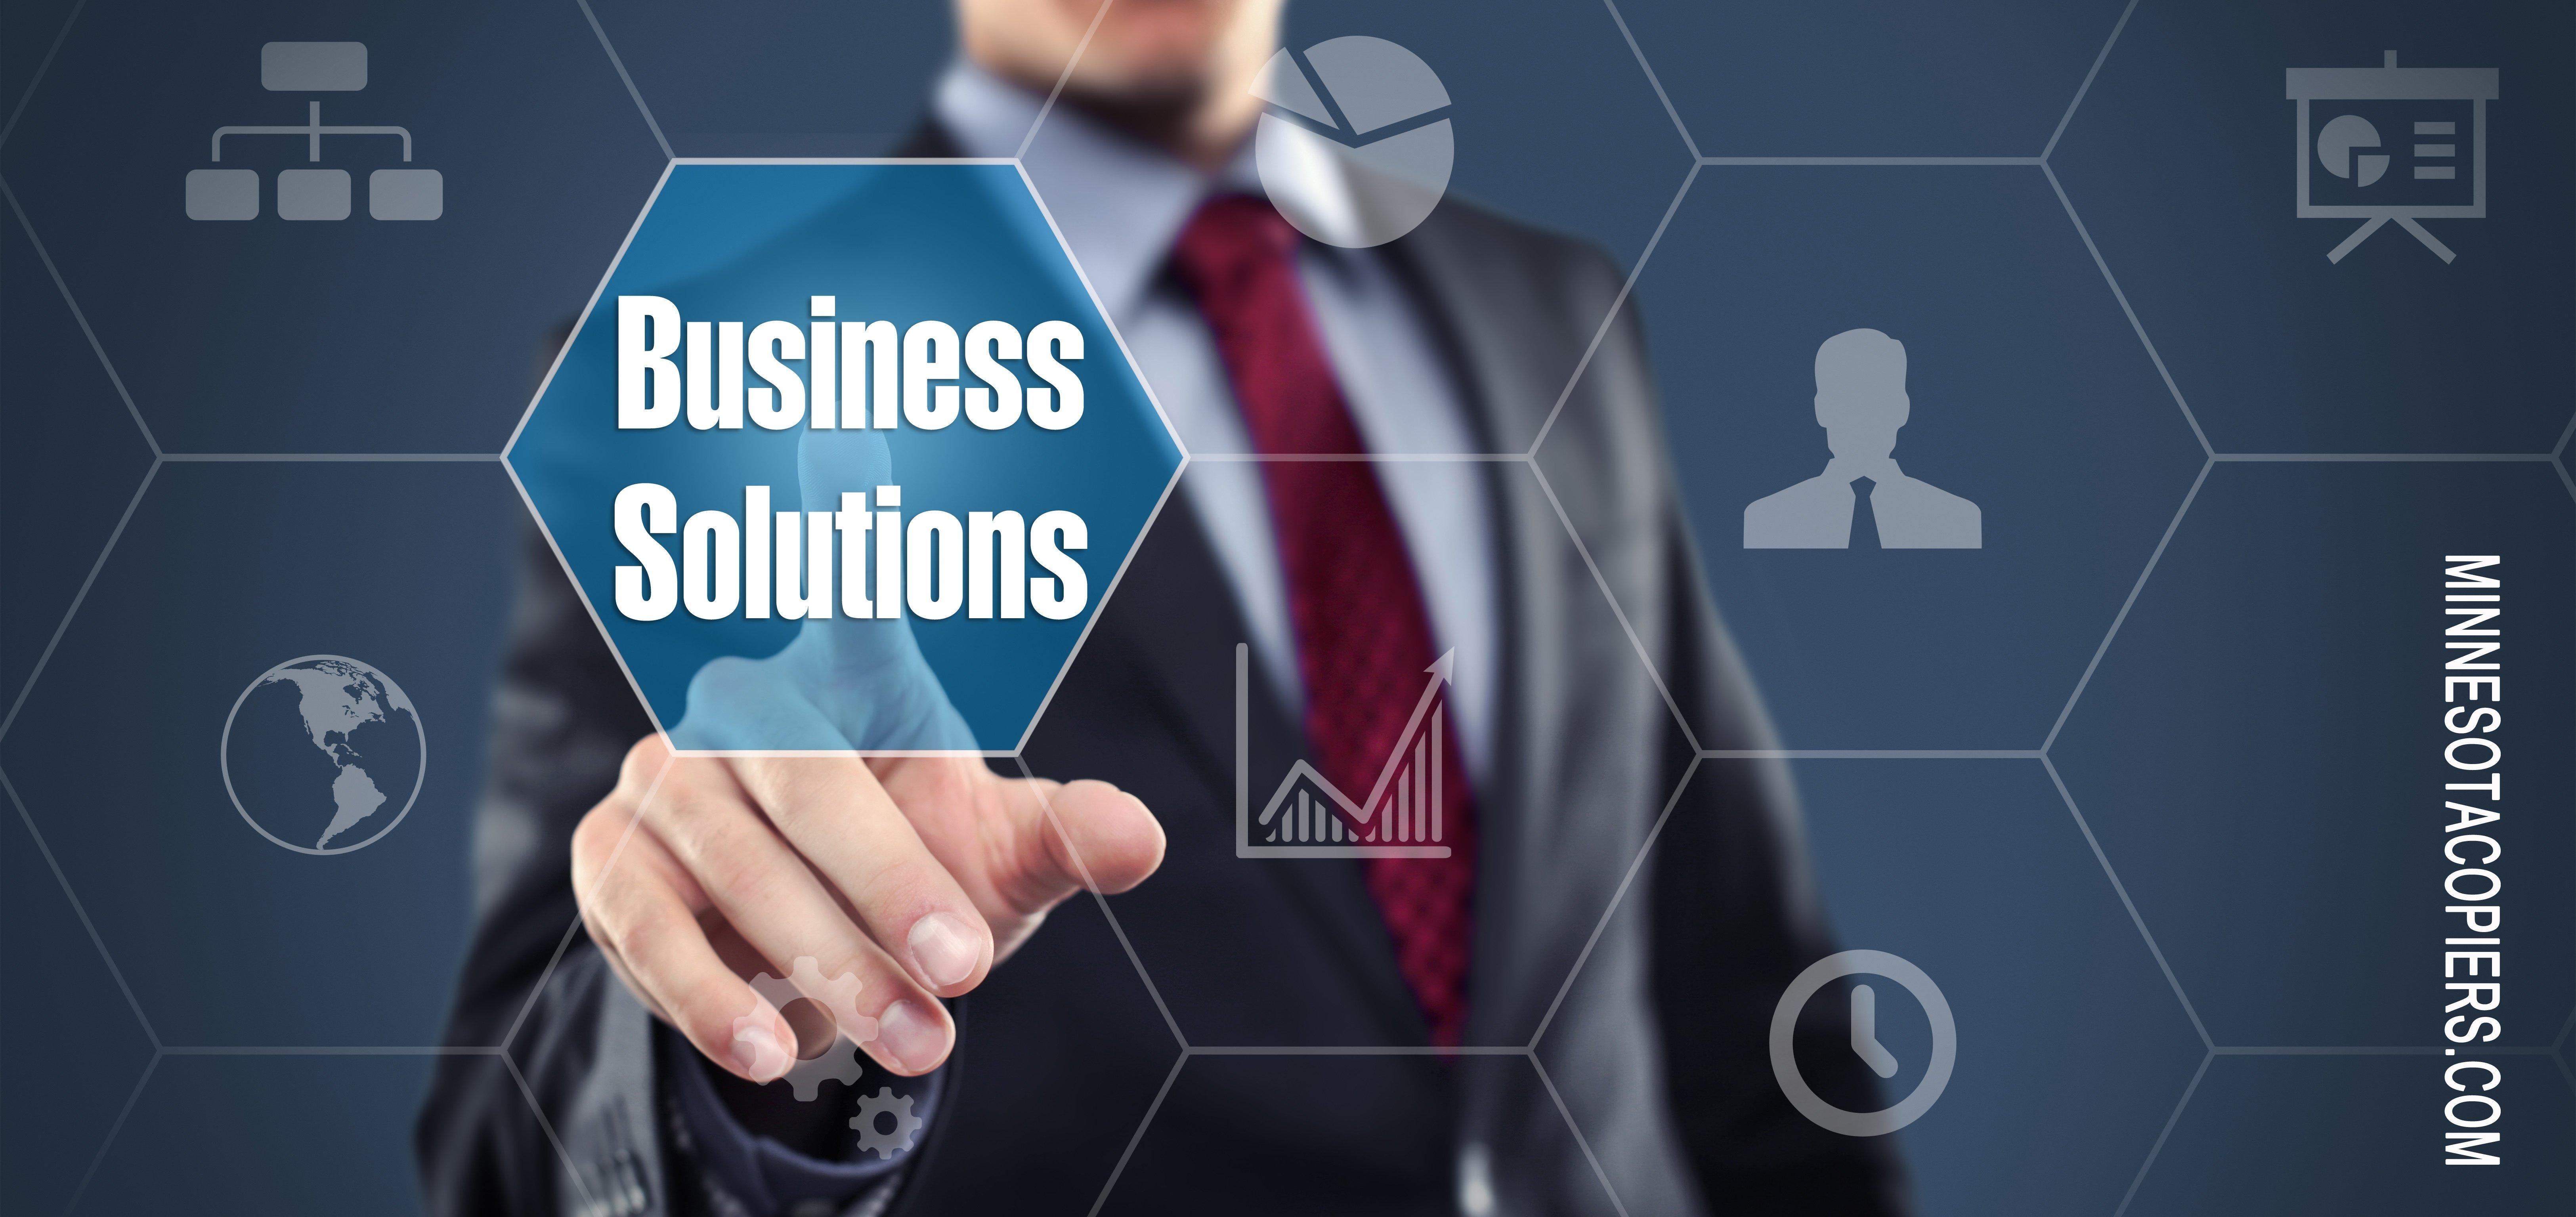 business_pinponit_scanning.jpg